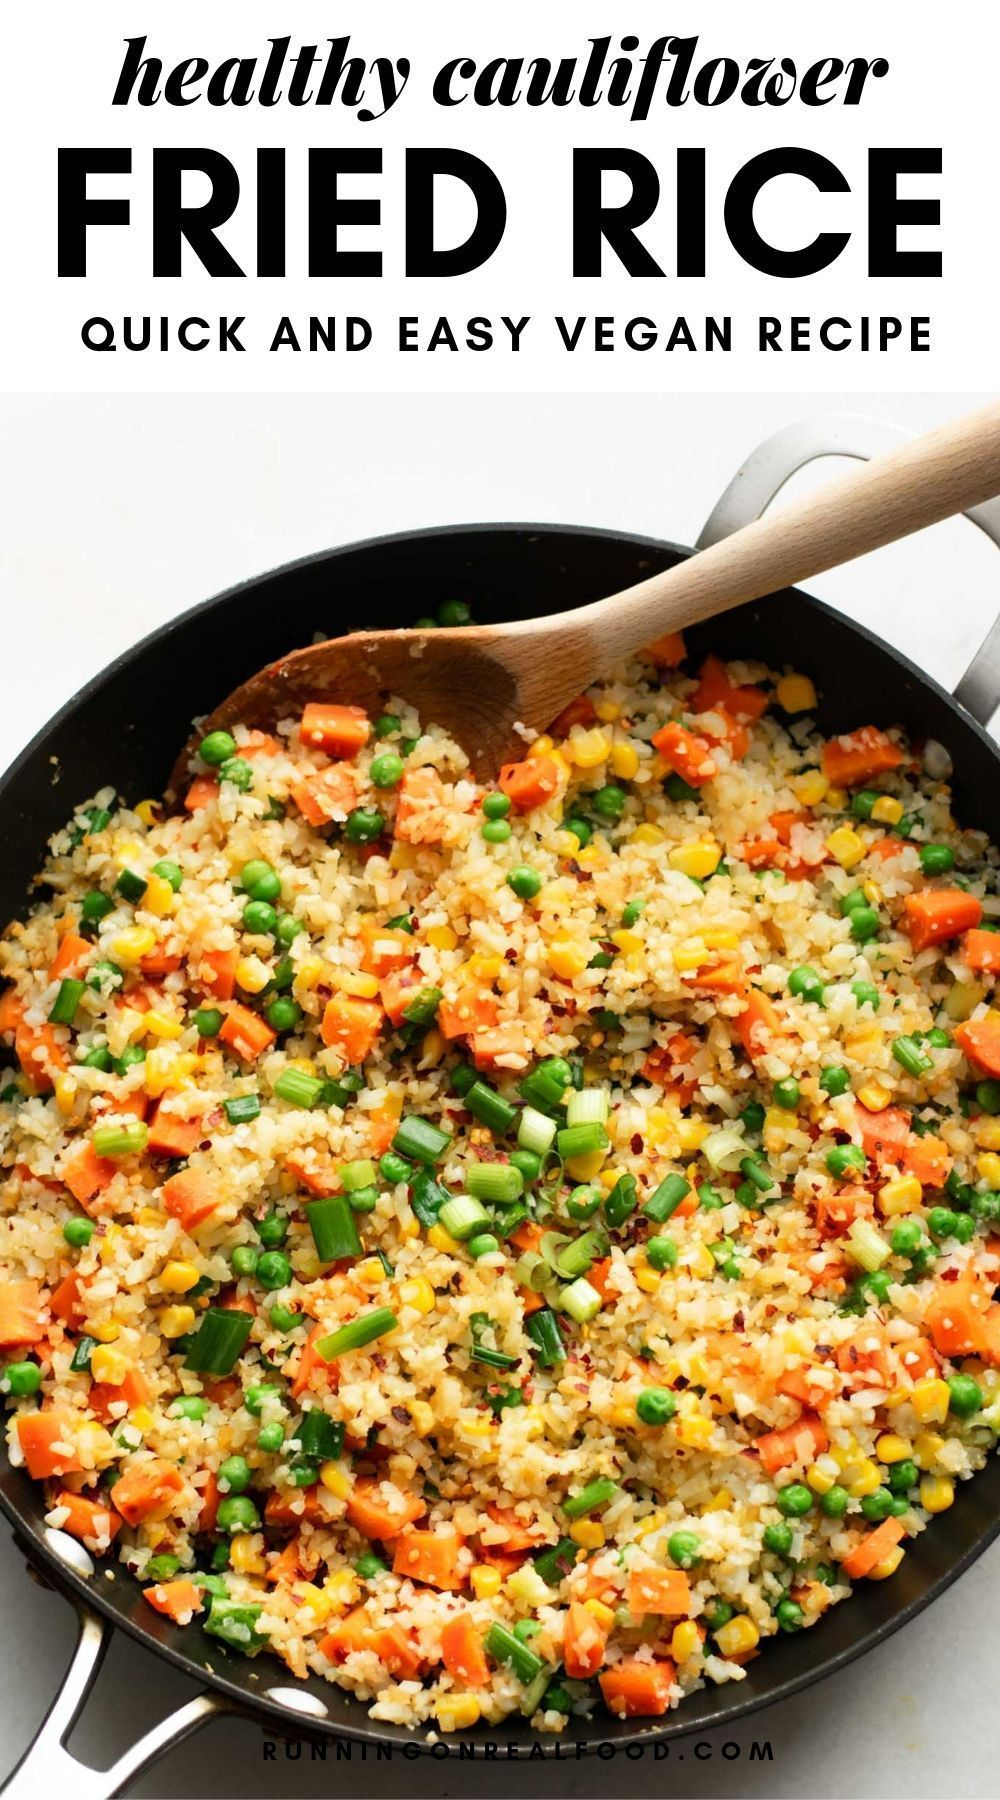 Healthy Vegan Cauliflower Fried Rice Recipe Healthy Recipes Vegan Dinner Recipes Vegan Cauliflower